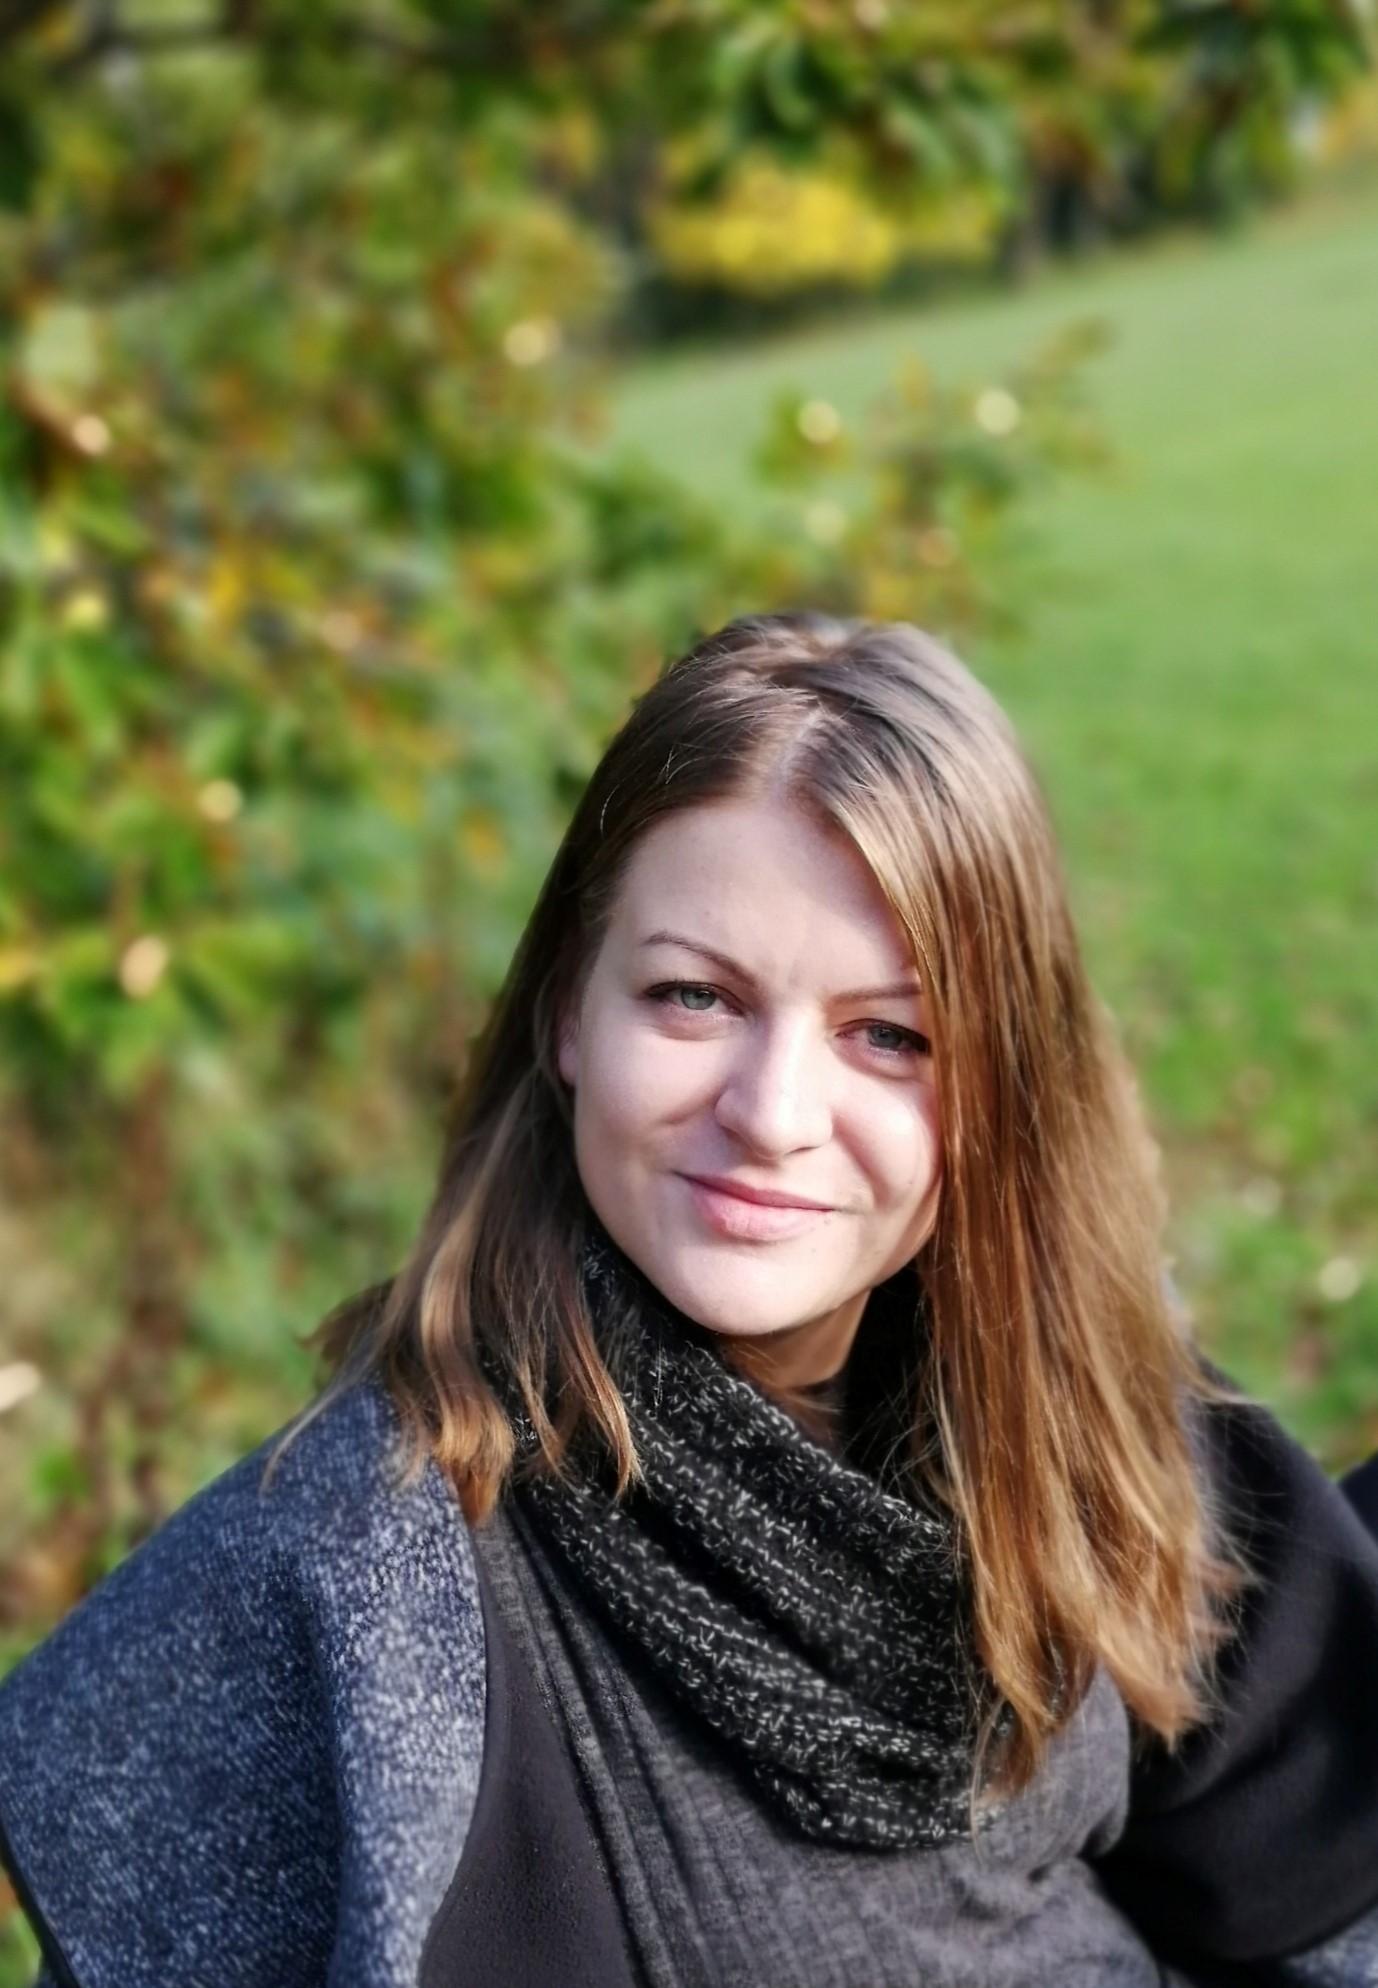 Dorota Michalek